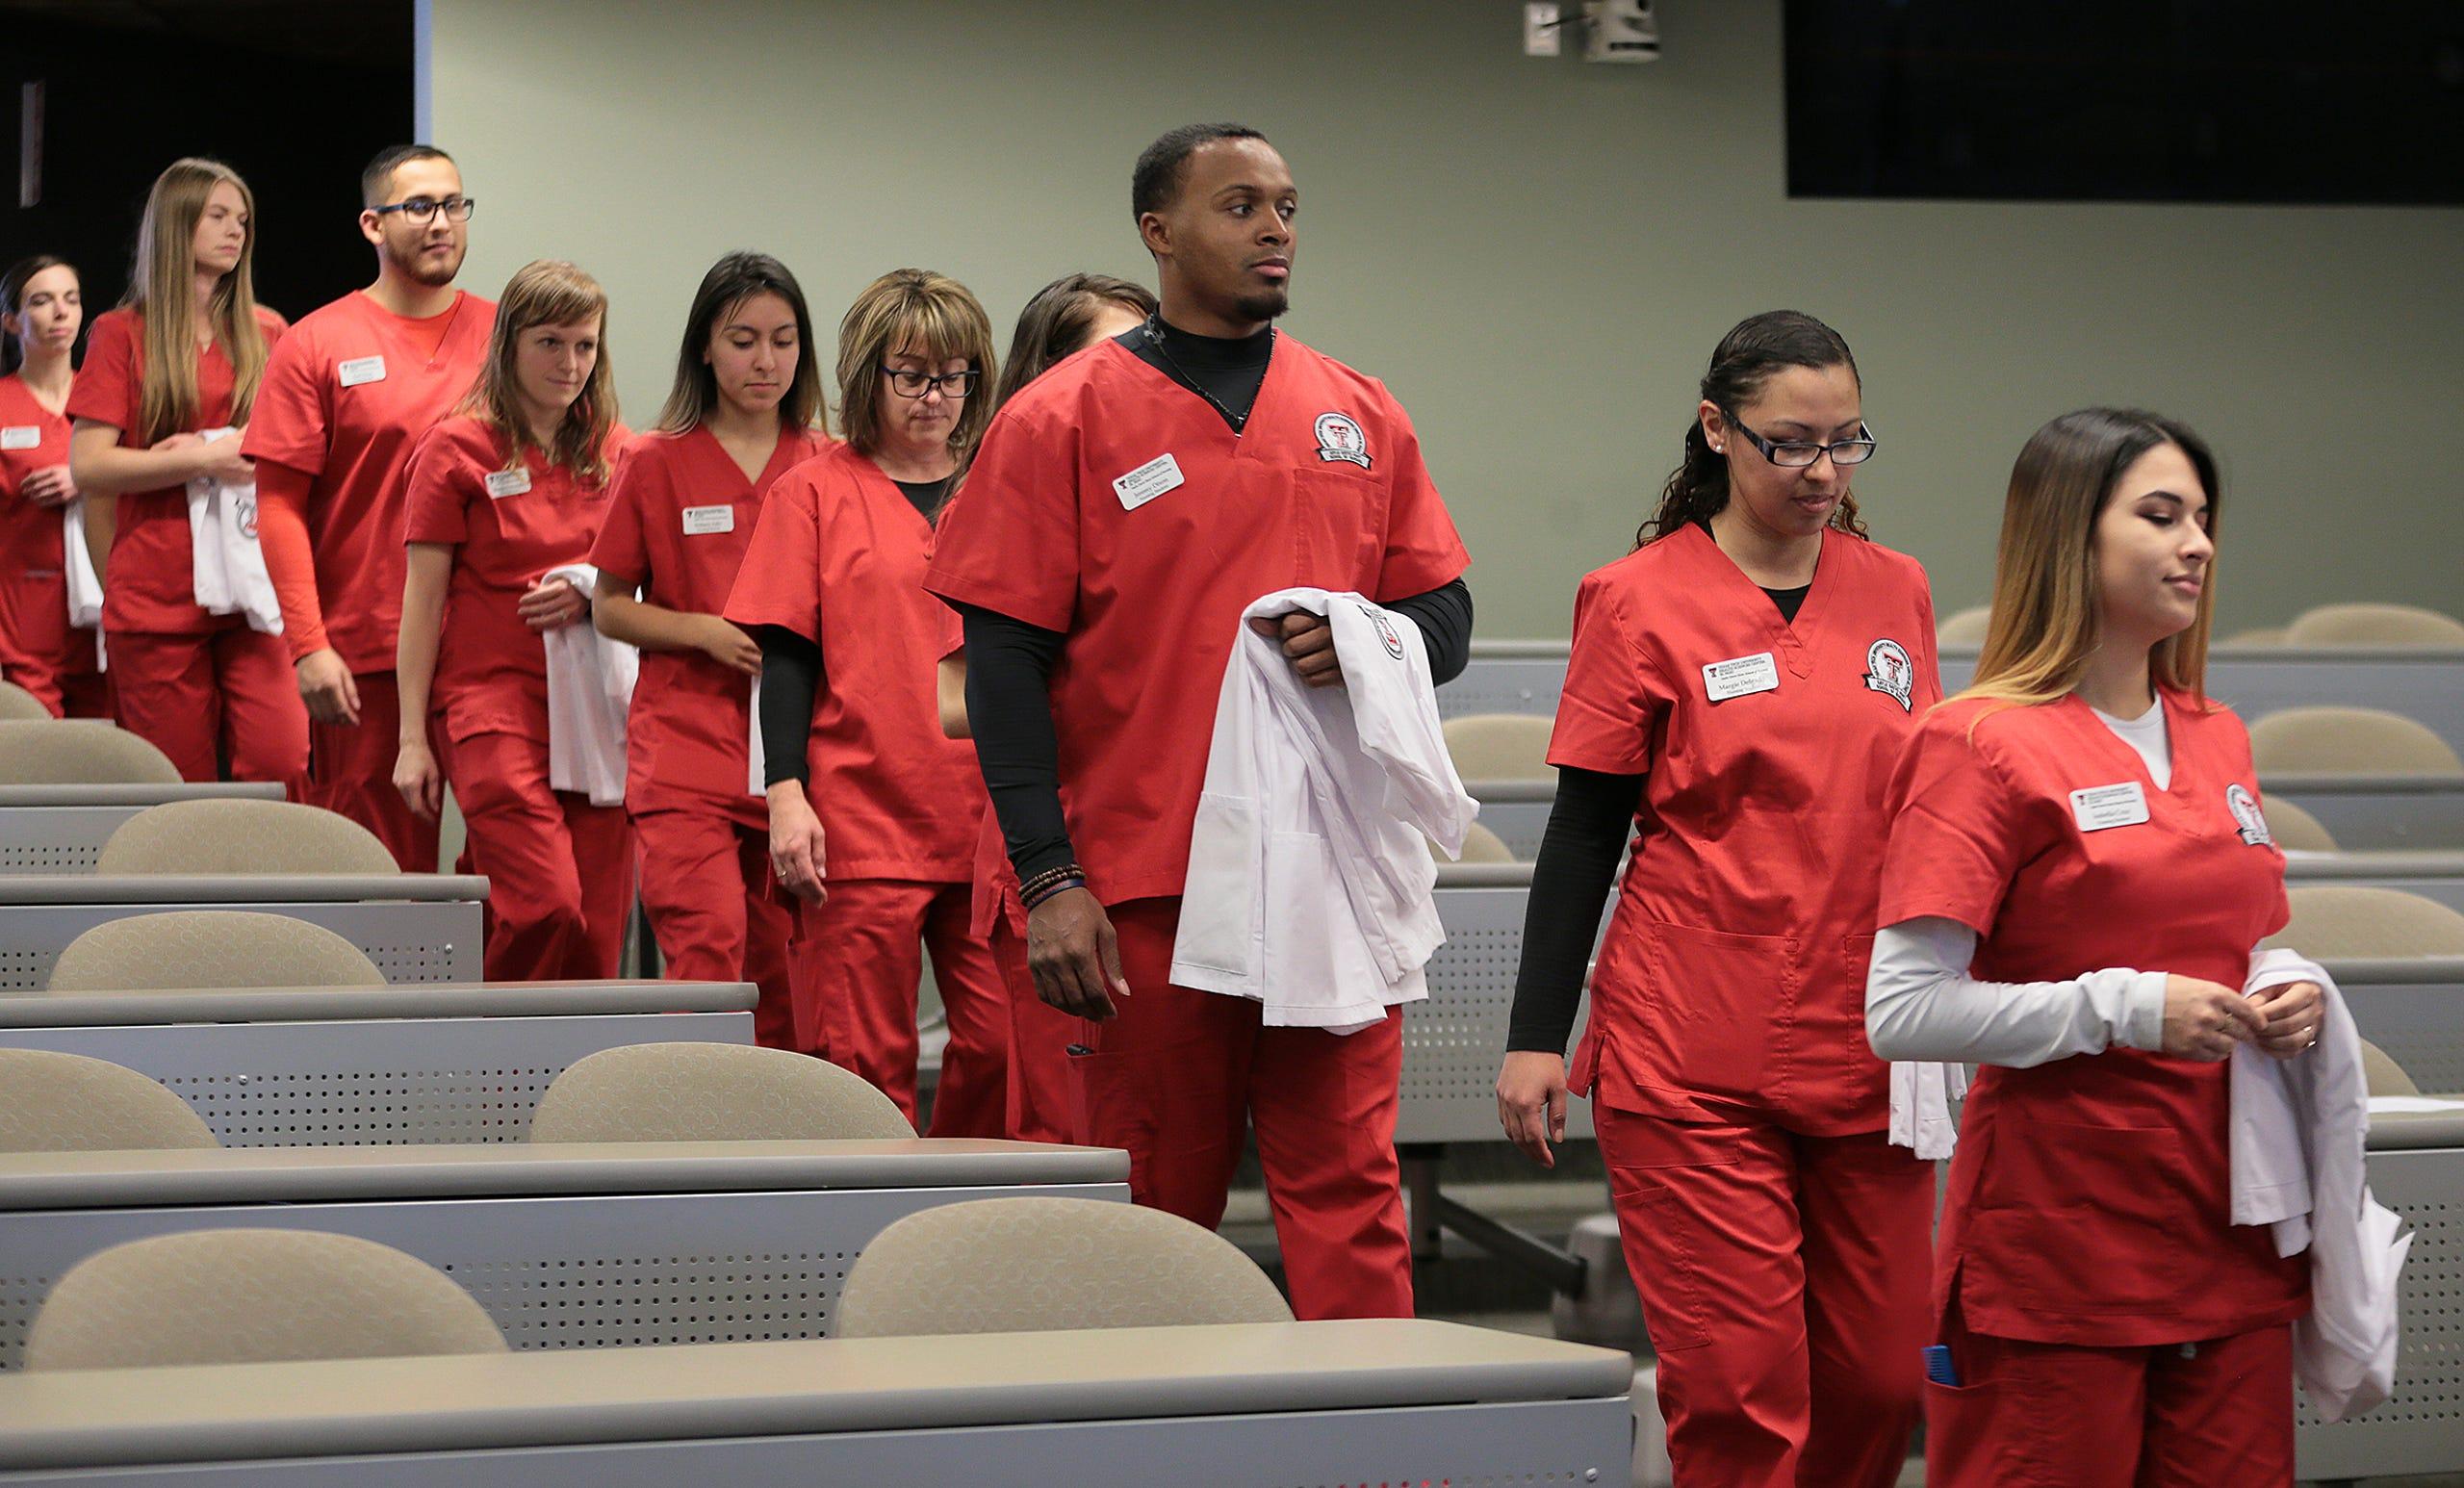 El Paso Nursing School Holds First Ever White Coat Ceremony